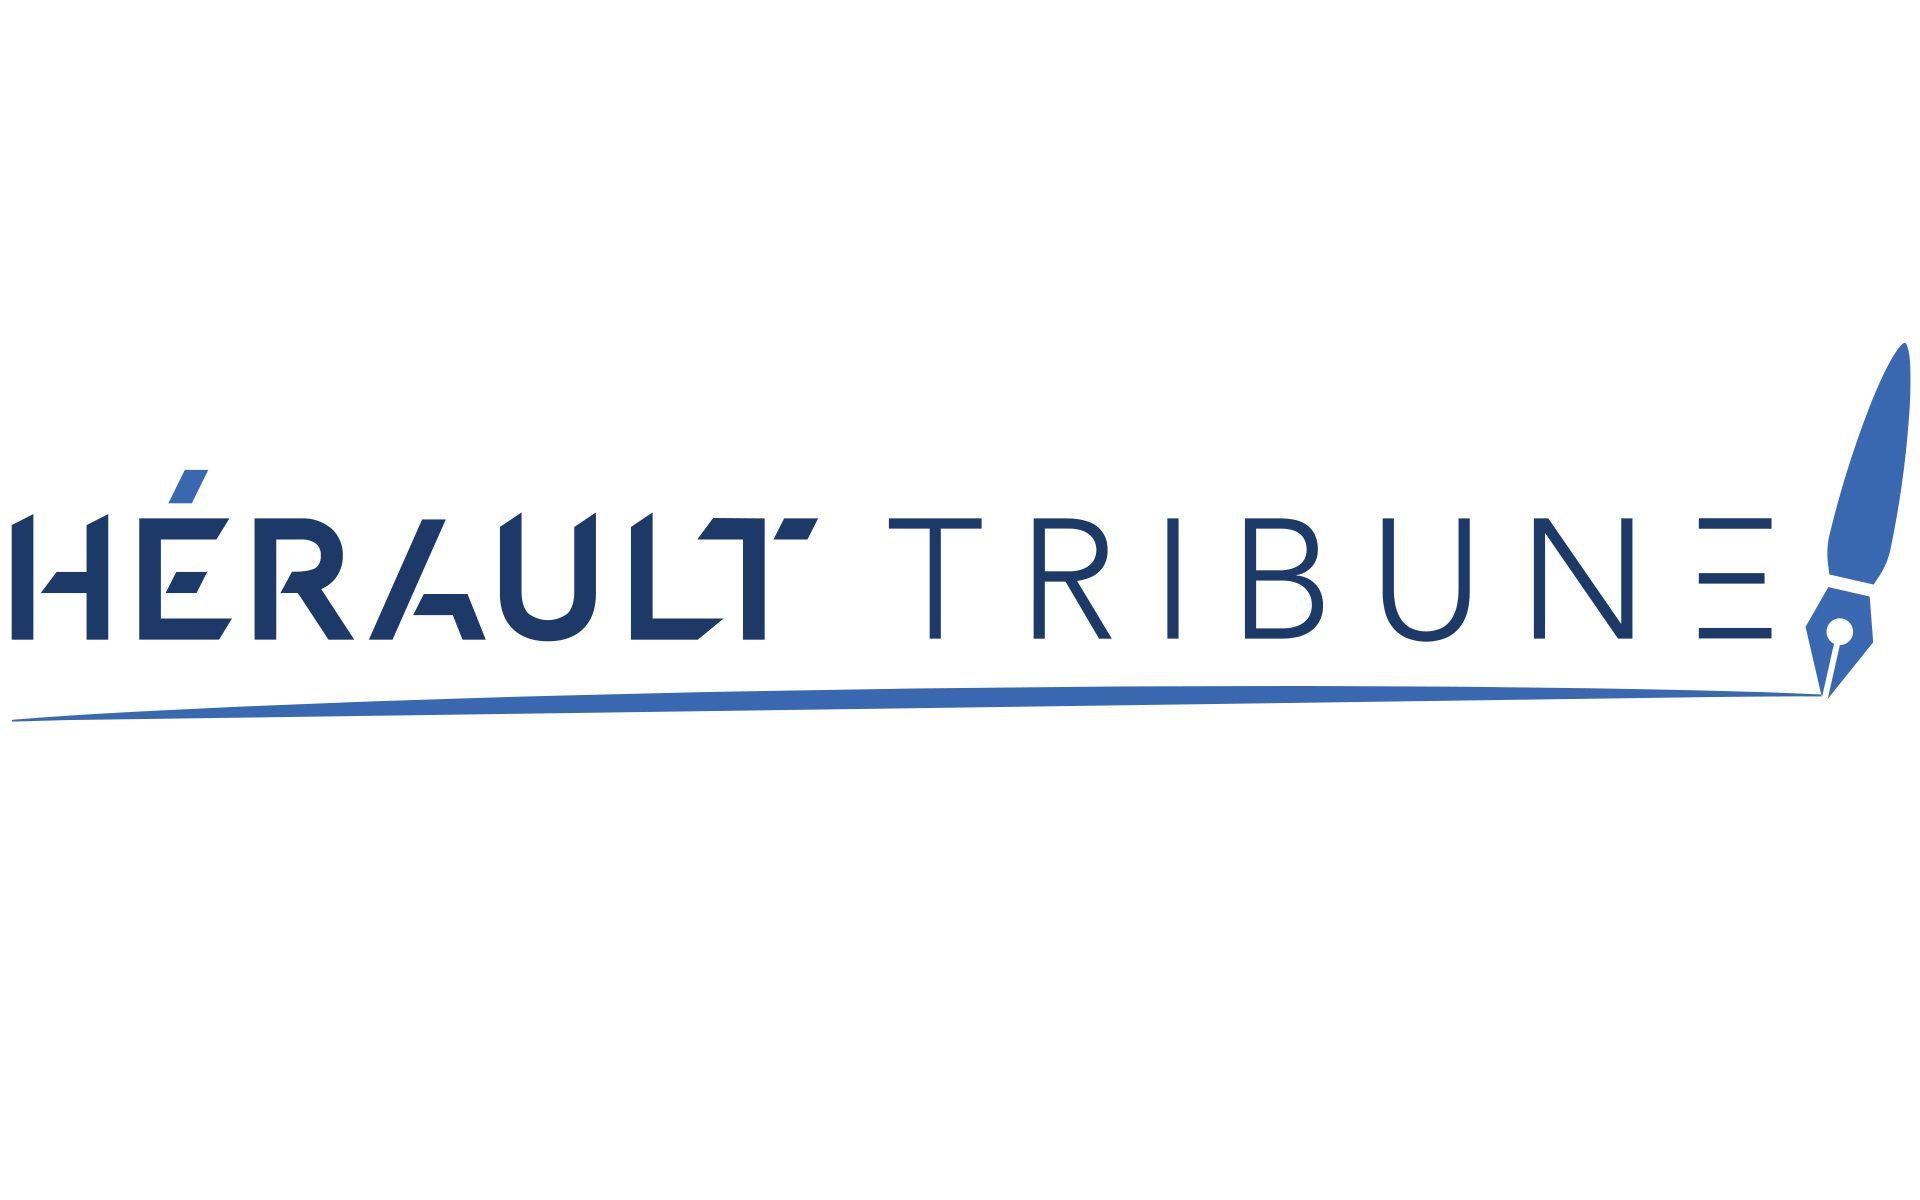 Logo Hérault Tribune